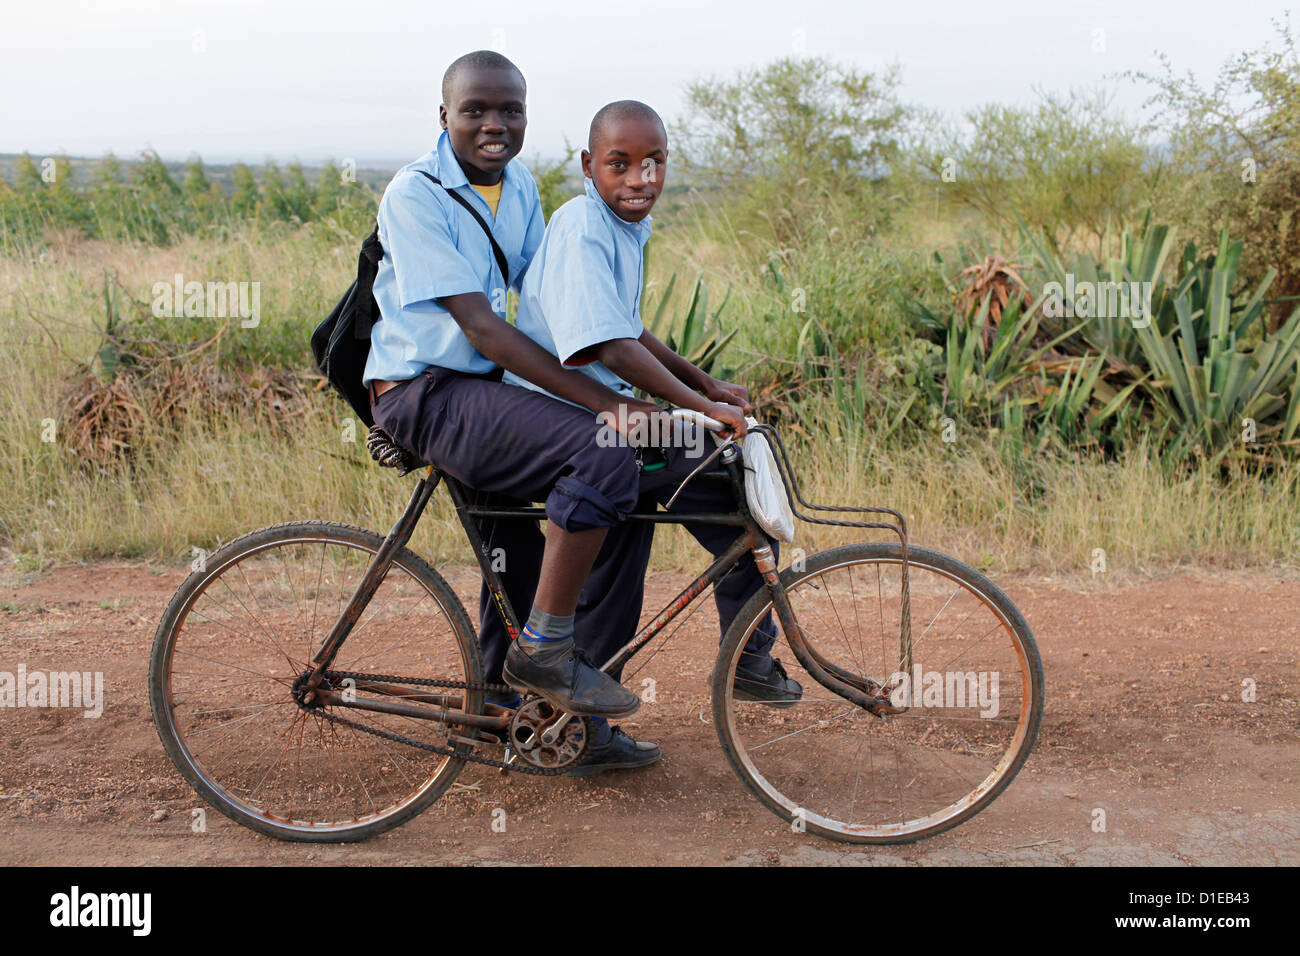 Schoolchildren on a bike, Embu, Kenya, East Africa, Africa - Stock Image